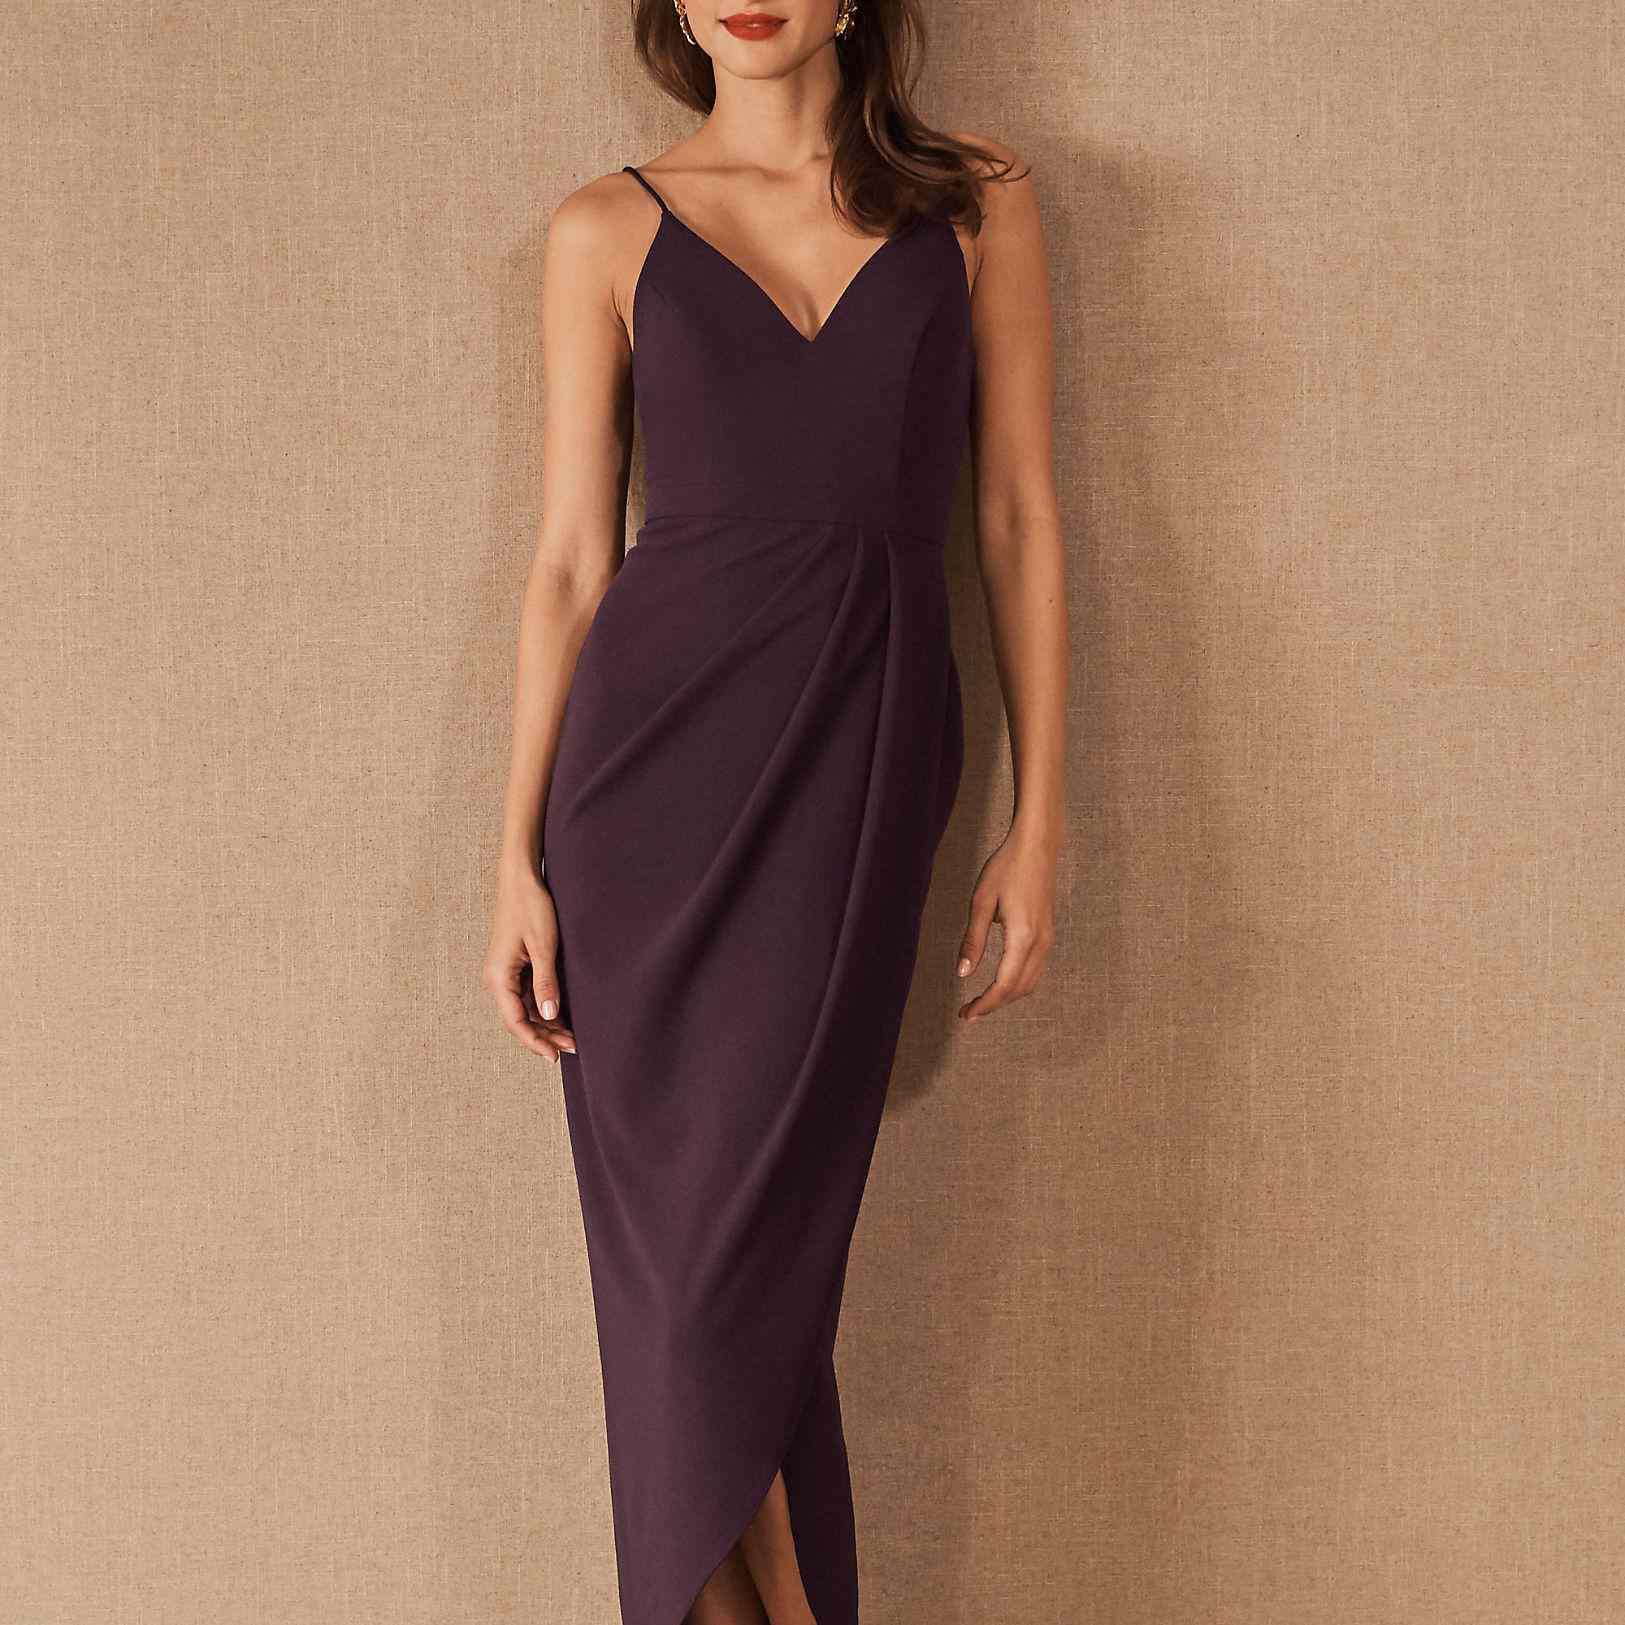 21 Ultra Stylish Plum Bridesmaid Dresses